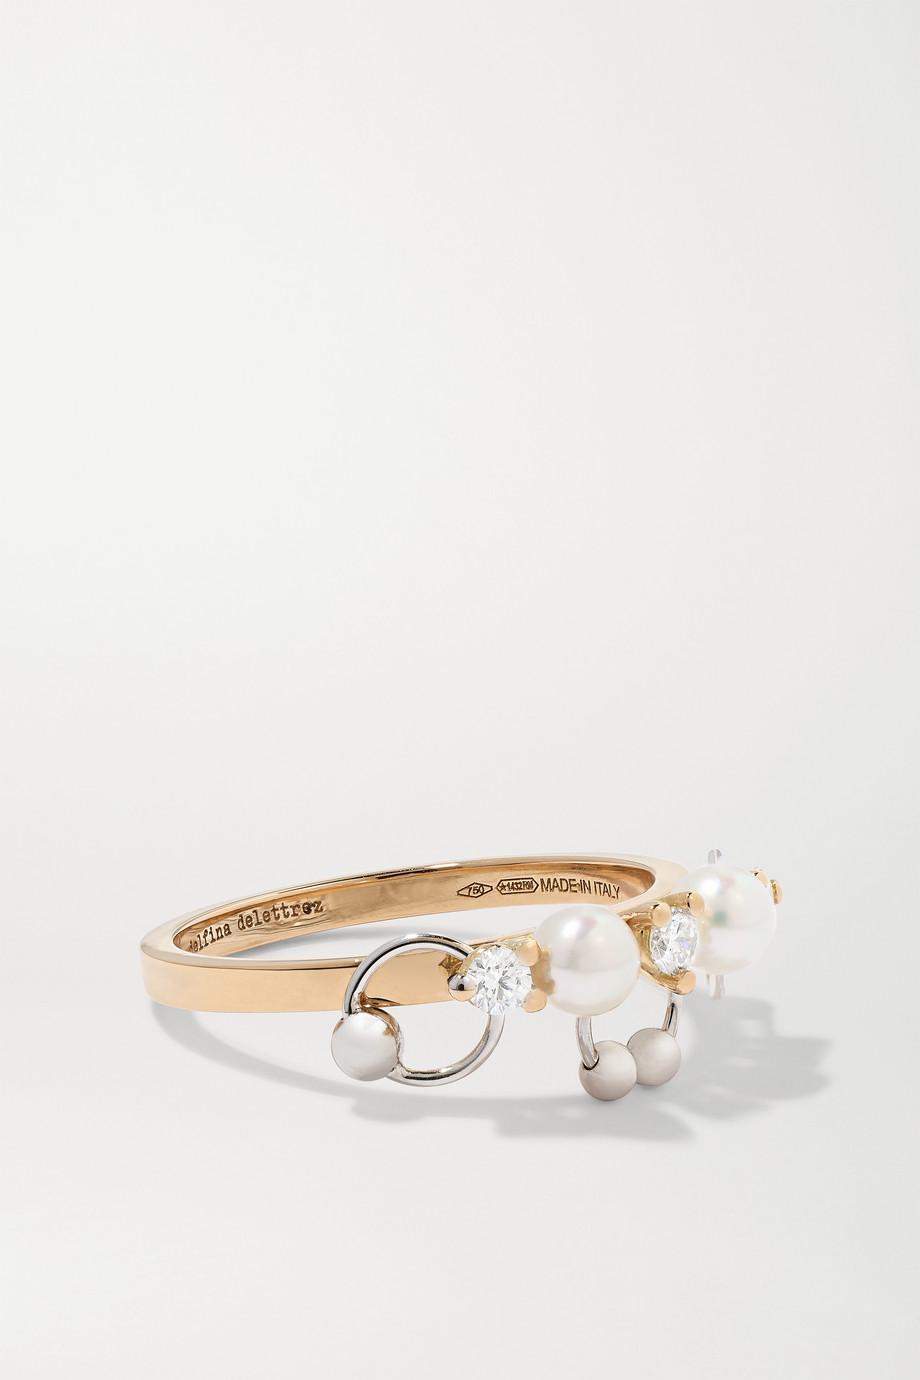 Delfina Delettrez 18-karat yellow and white gold, diamond and pearl ring